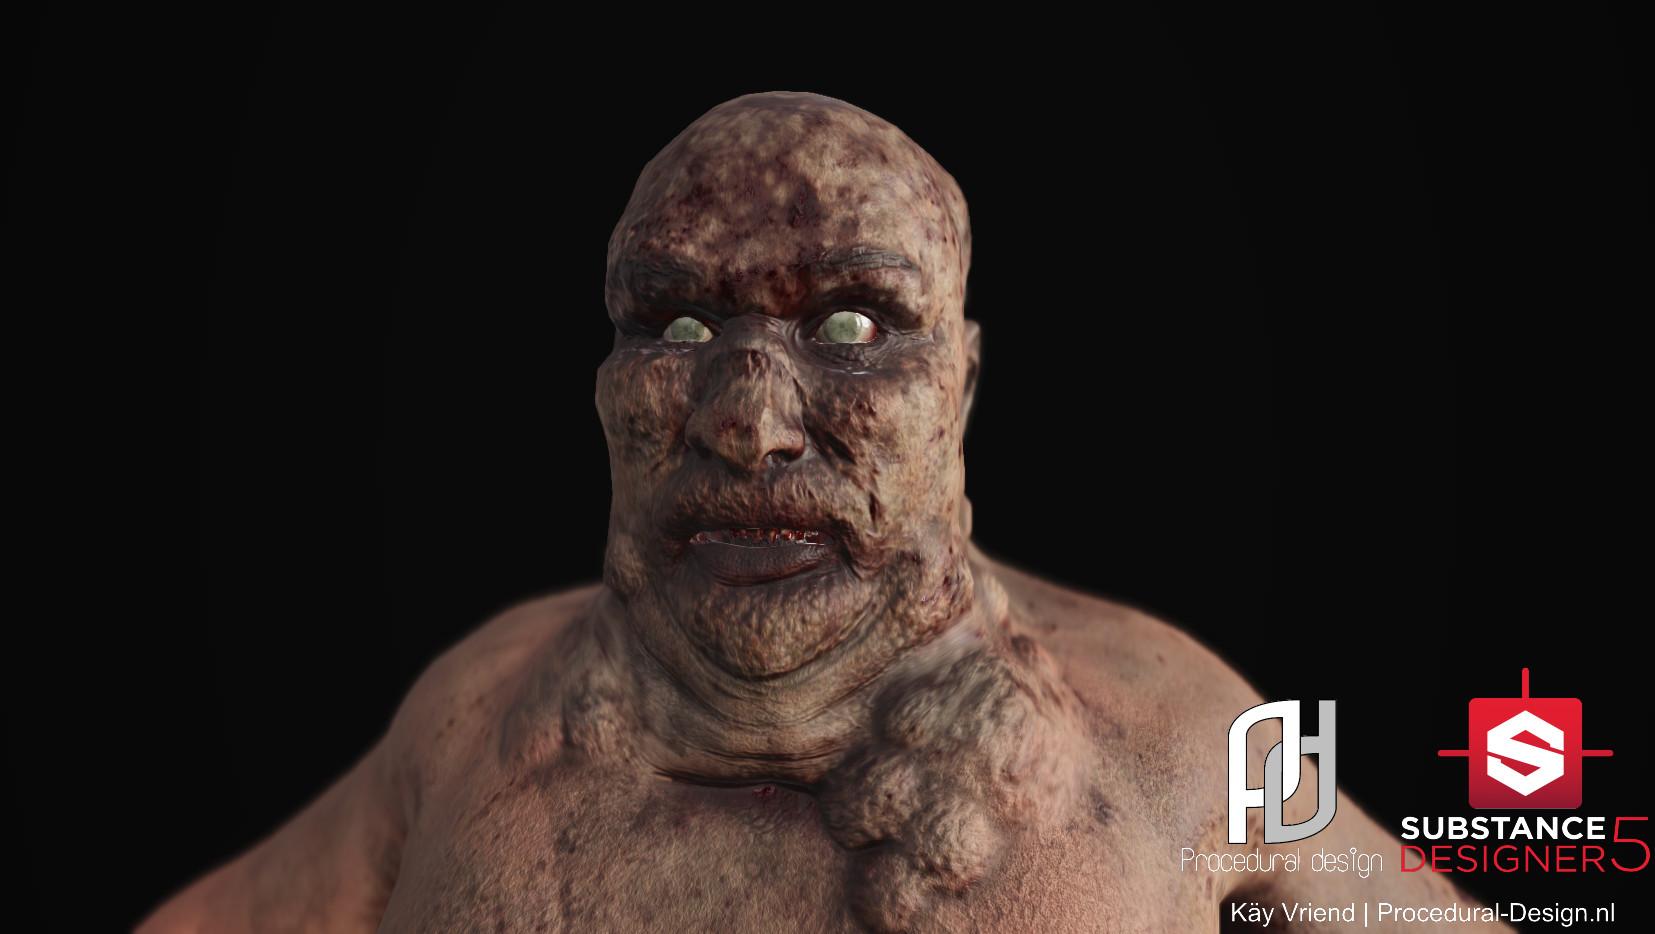 Kay vriend zombie 5